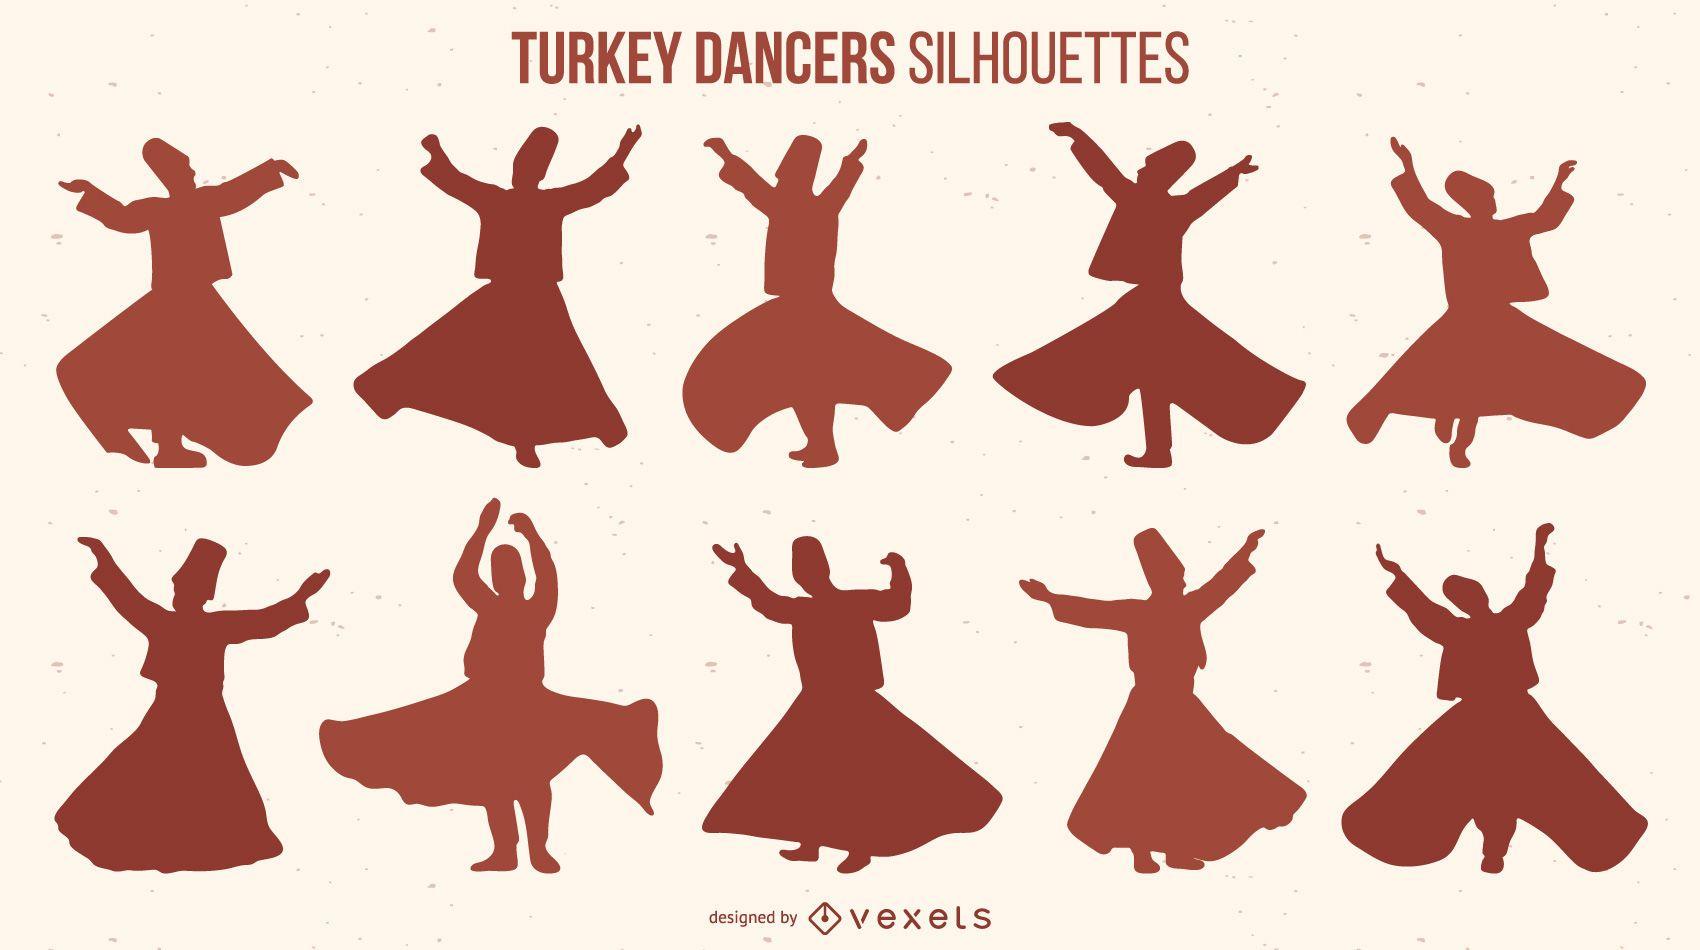 Turkey Dancers Silhouette pack